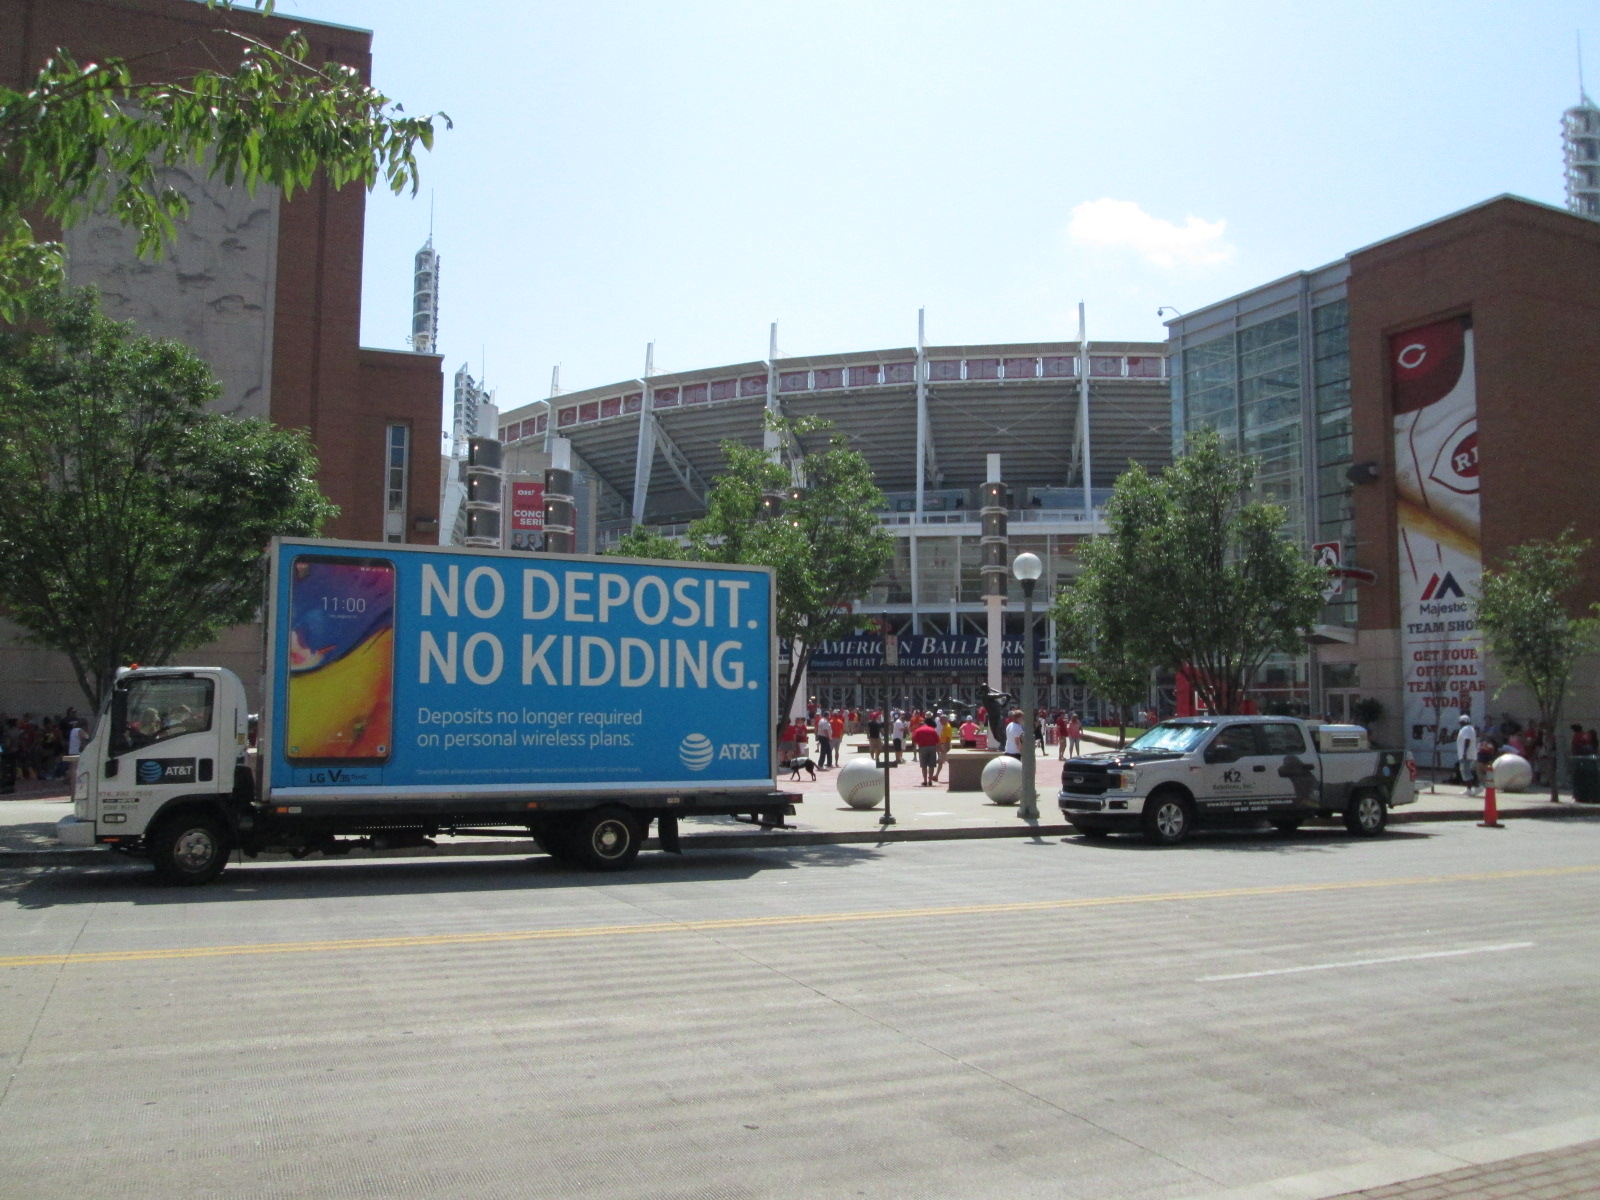 Mobile billboard truck in Cincinnati OH